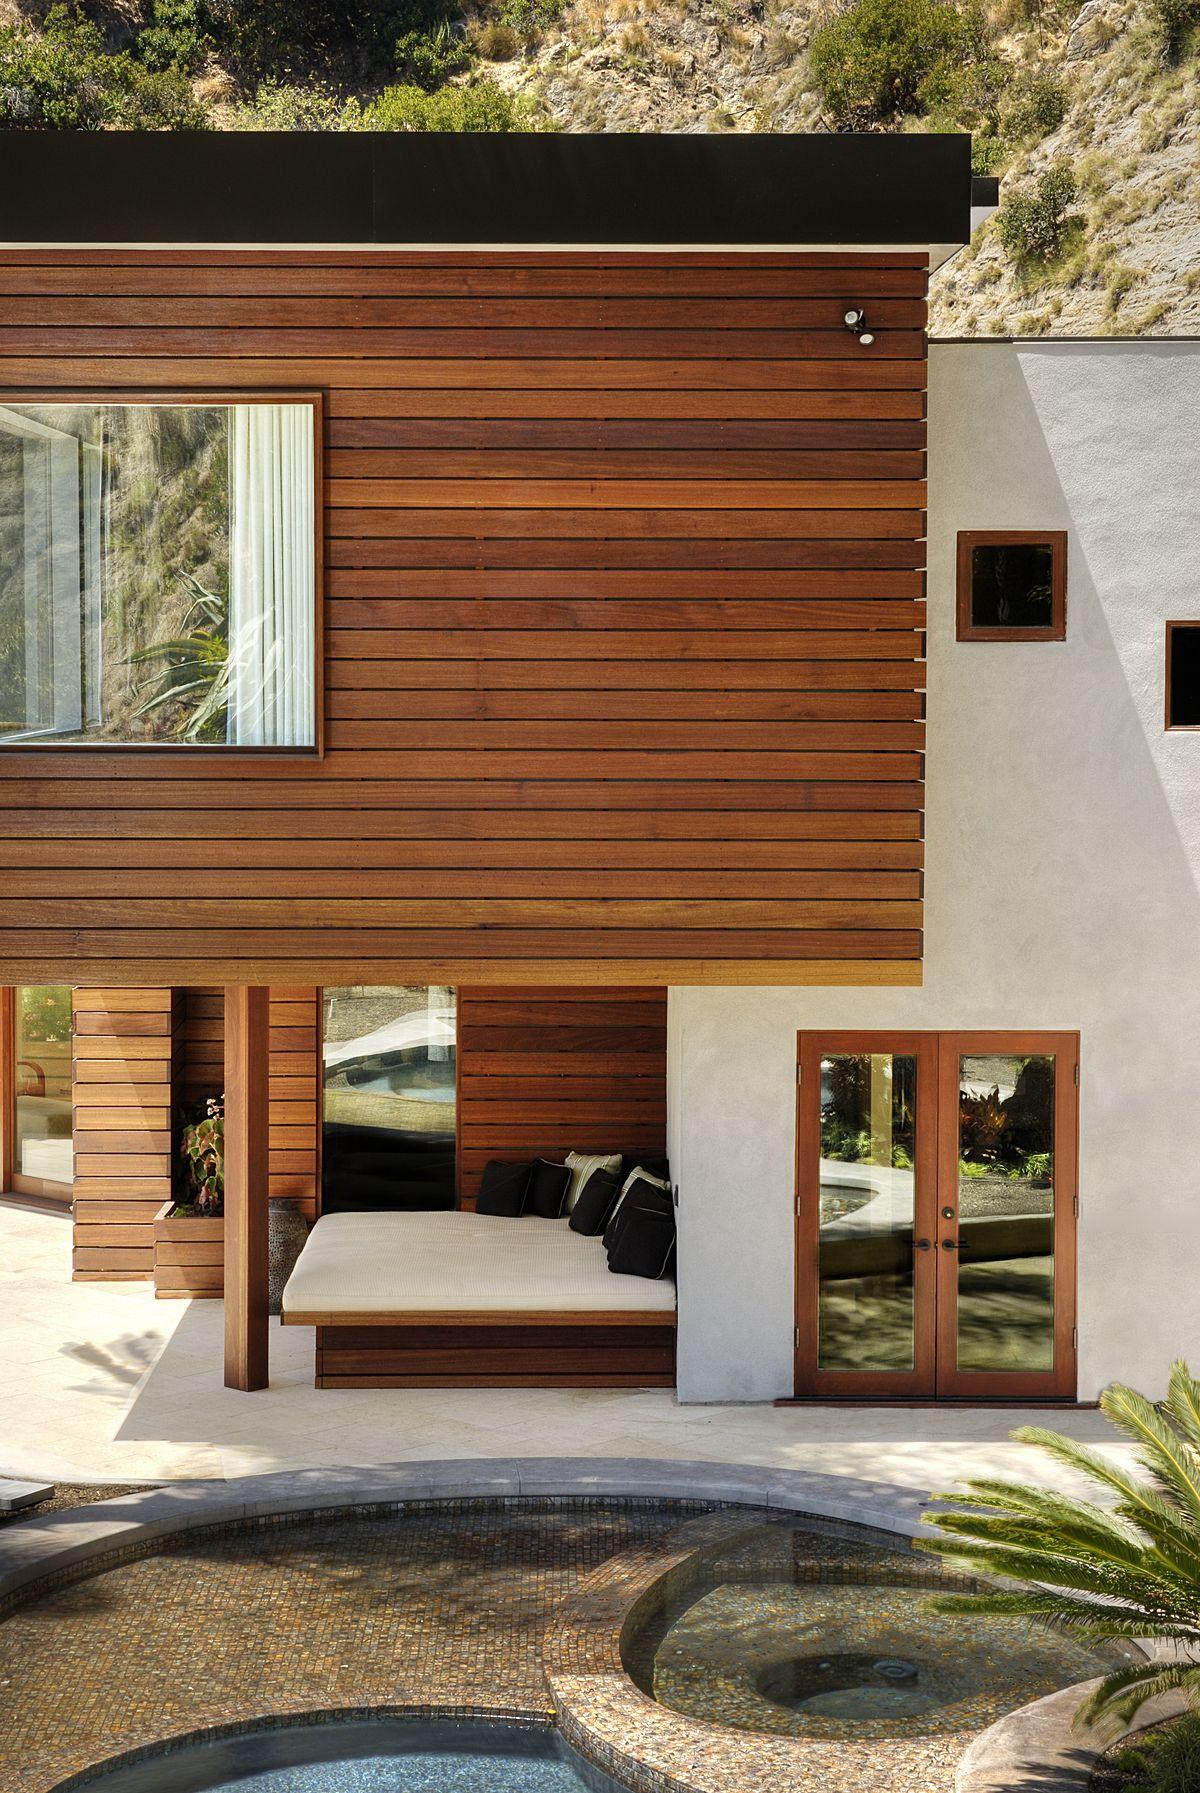 Contemporary Exterior Design Modern Wood Siding Modern House Exterior Elevation: Modern Architecture, Architecture, Interior Architecture